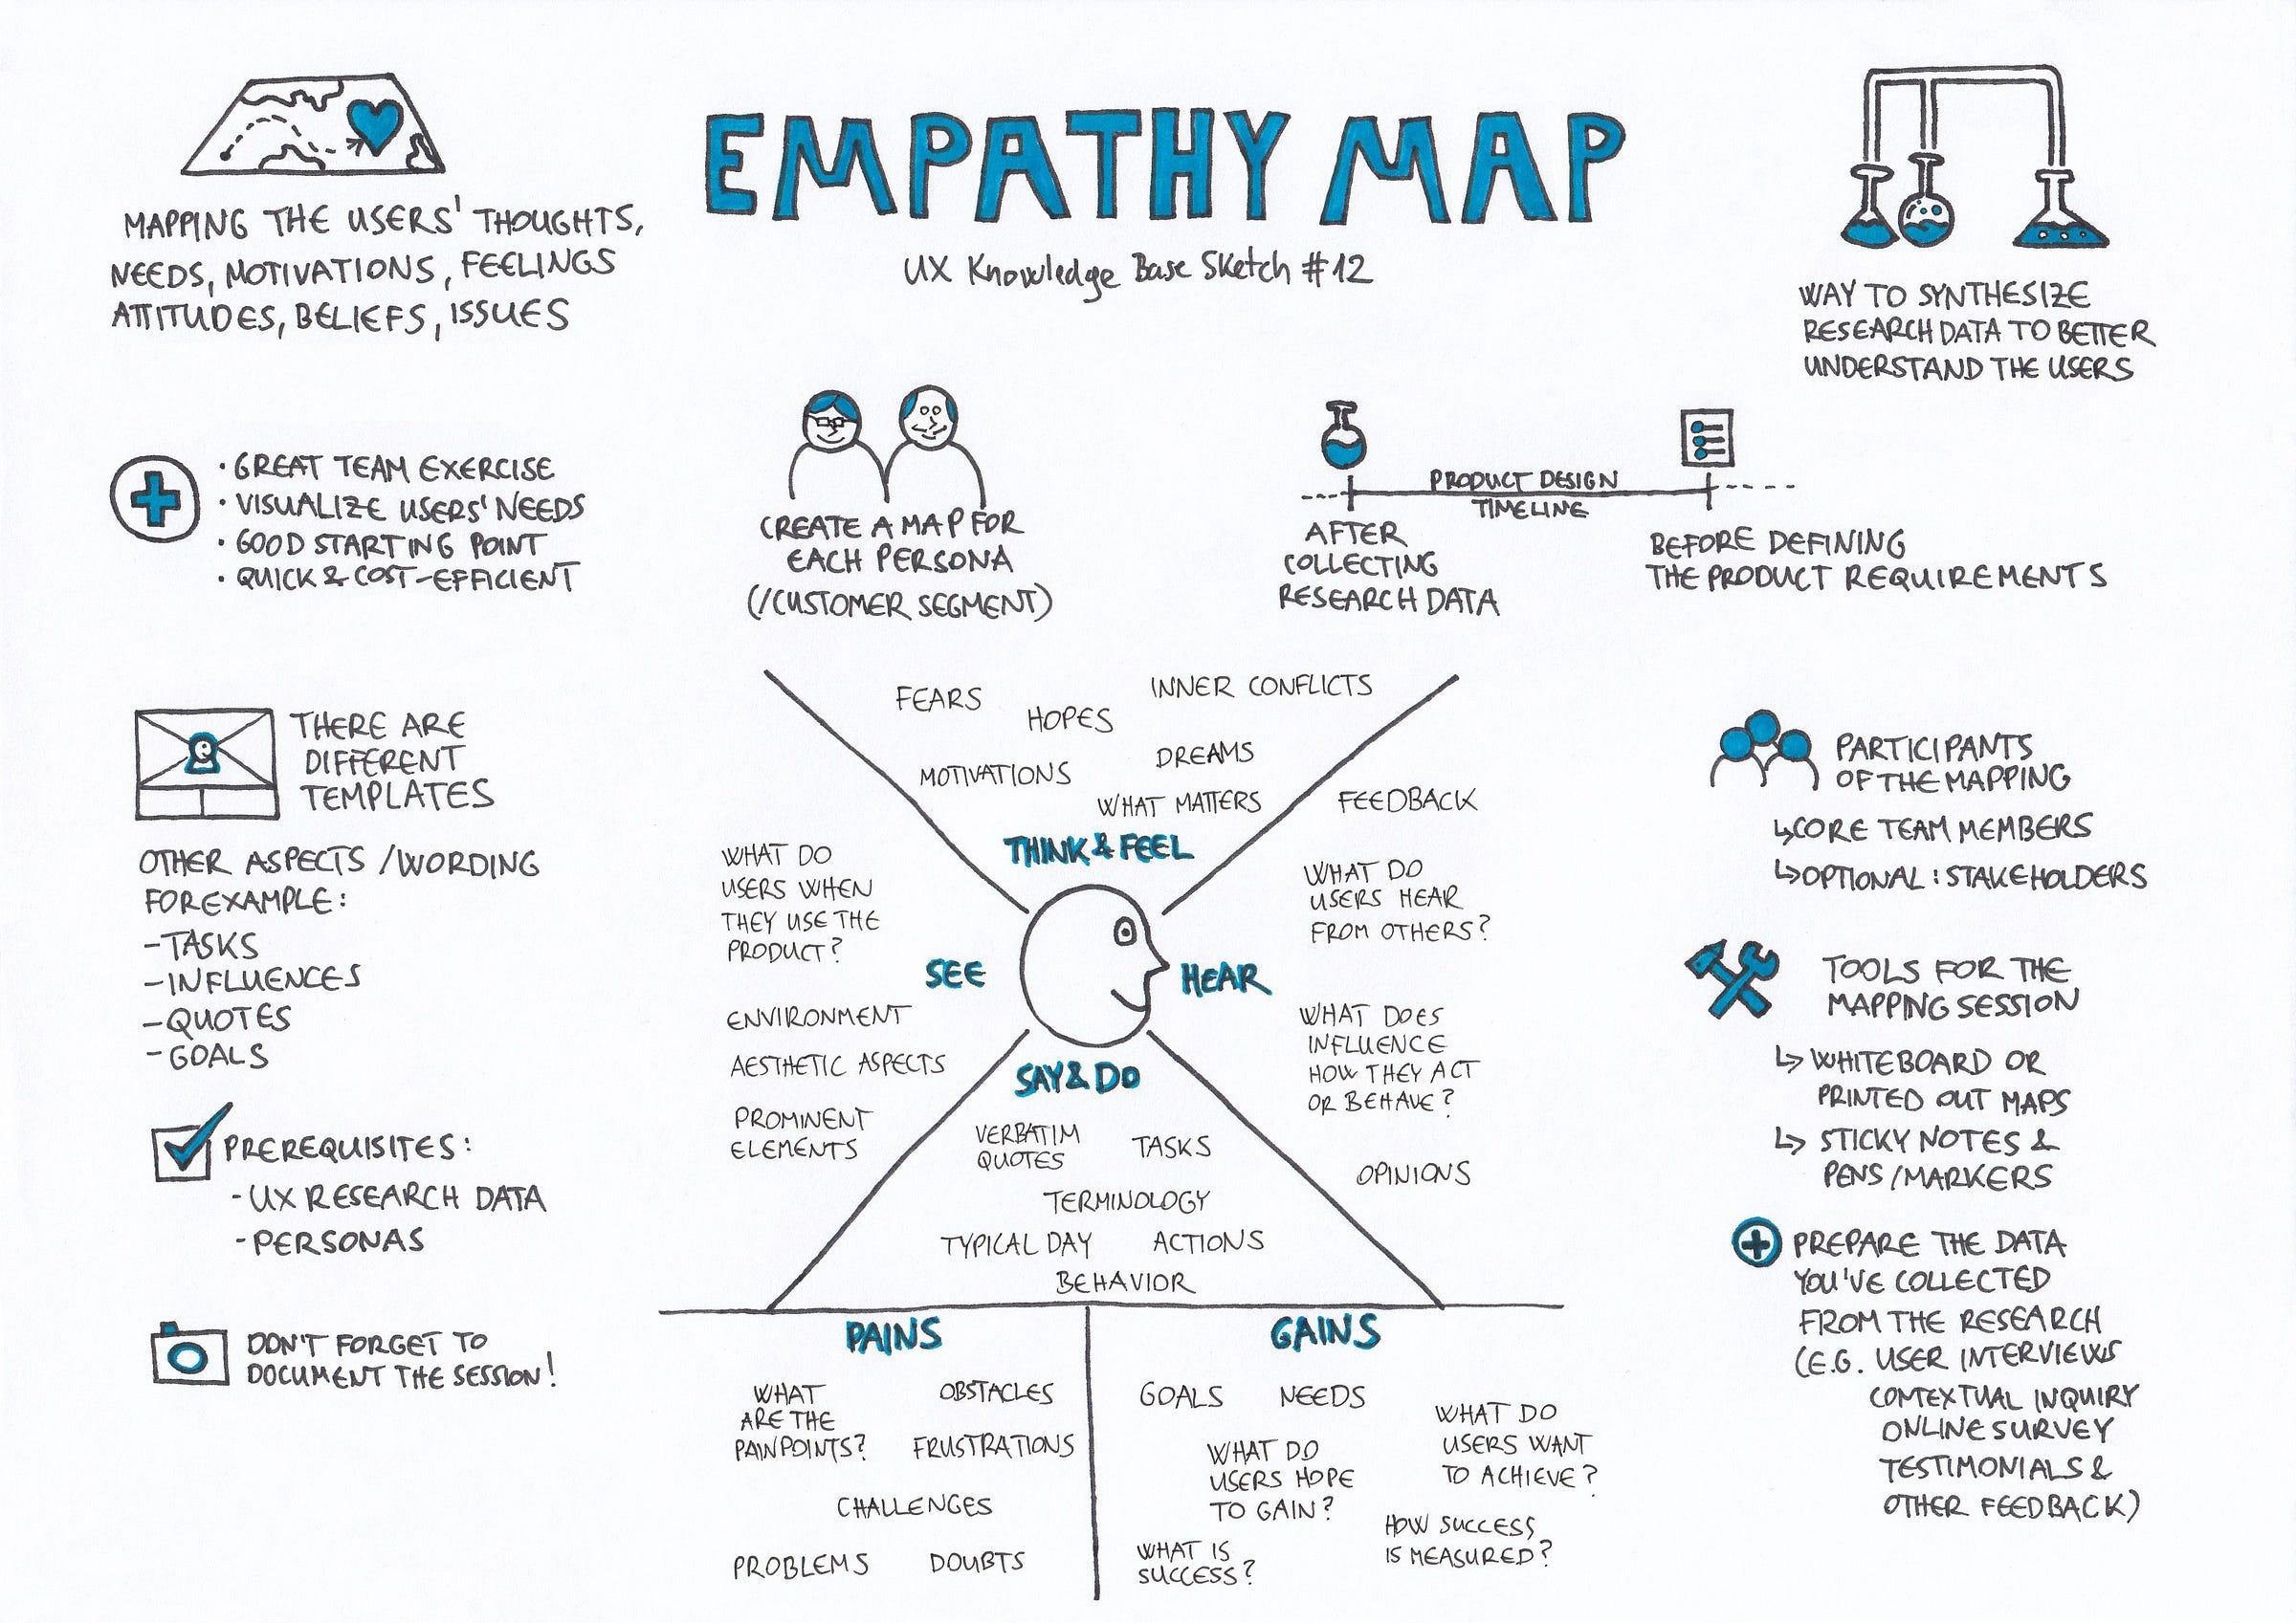 Empathy Map Ux Knowledge Base Sketch